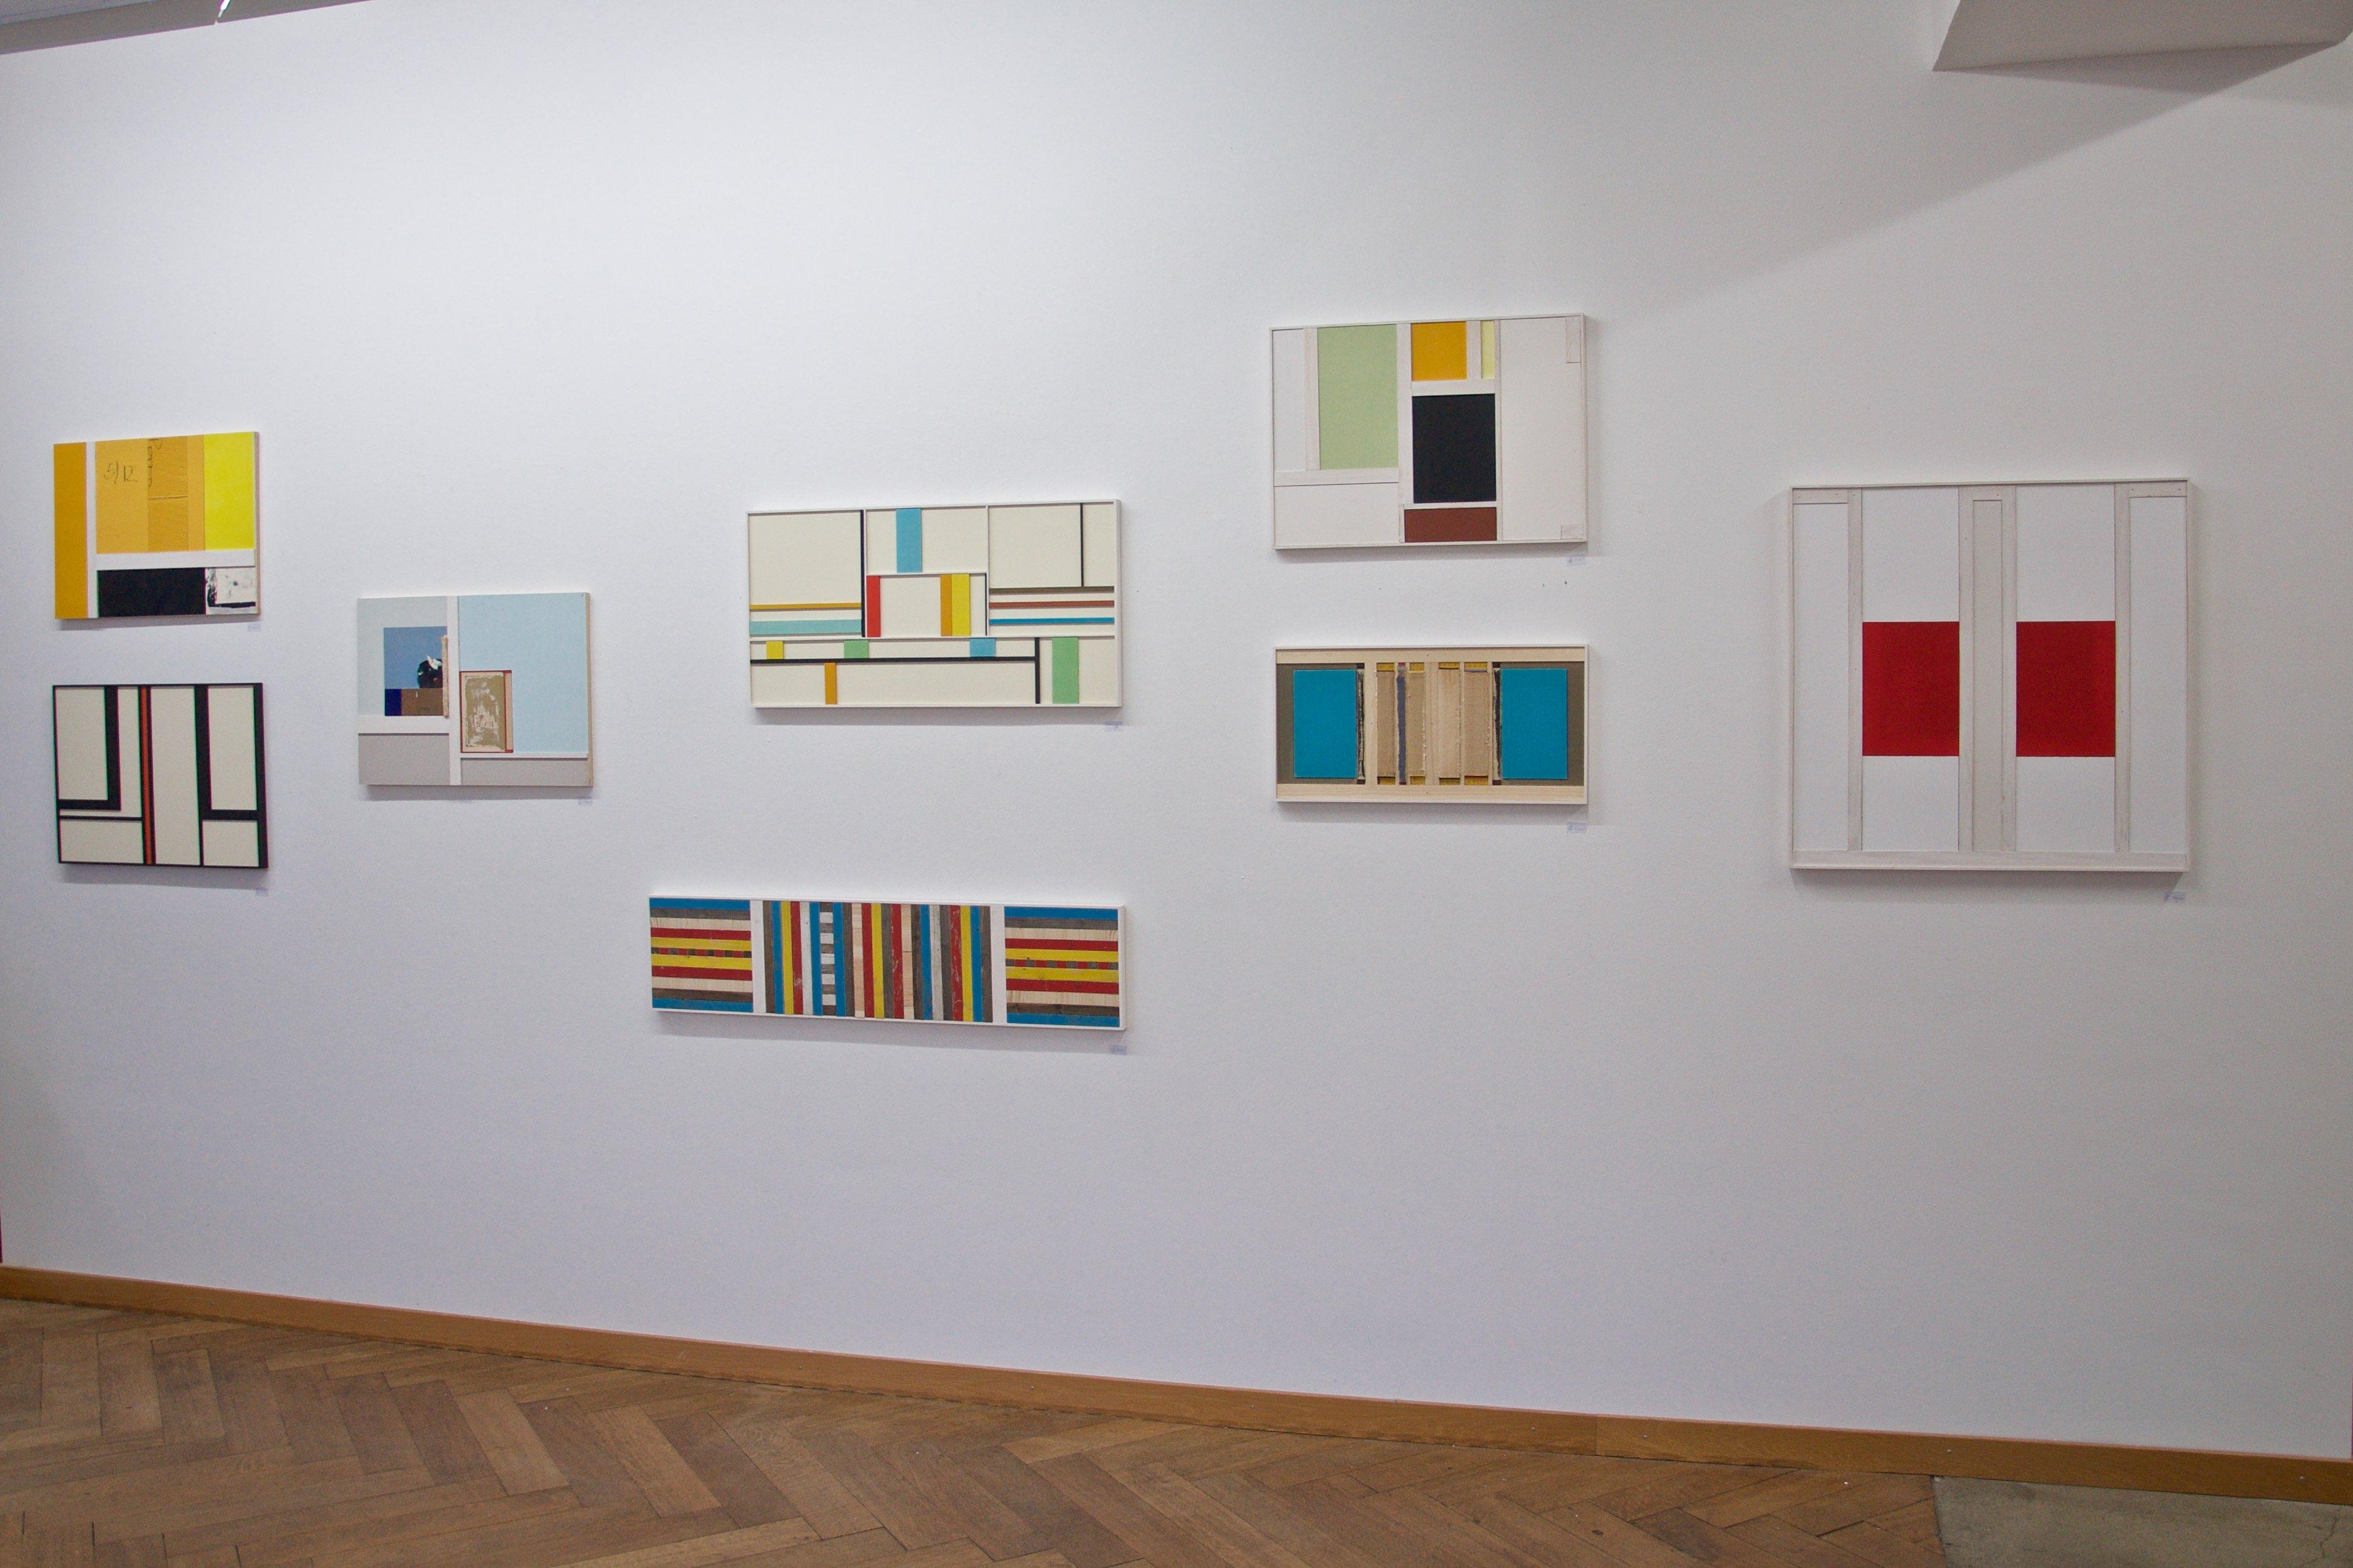 Gruppenausstellung Galerie Katapult 2013